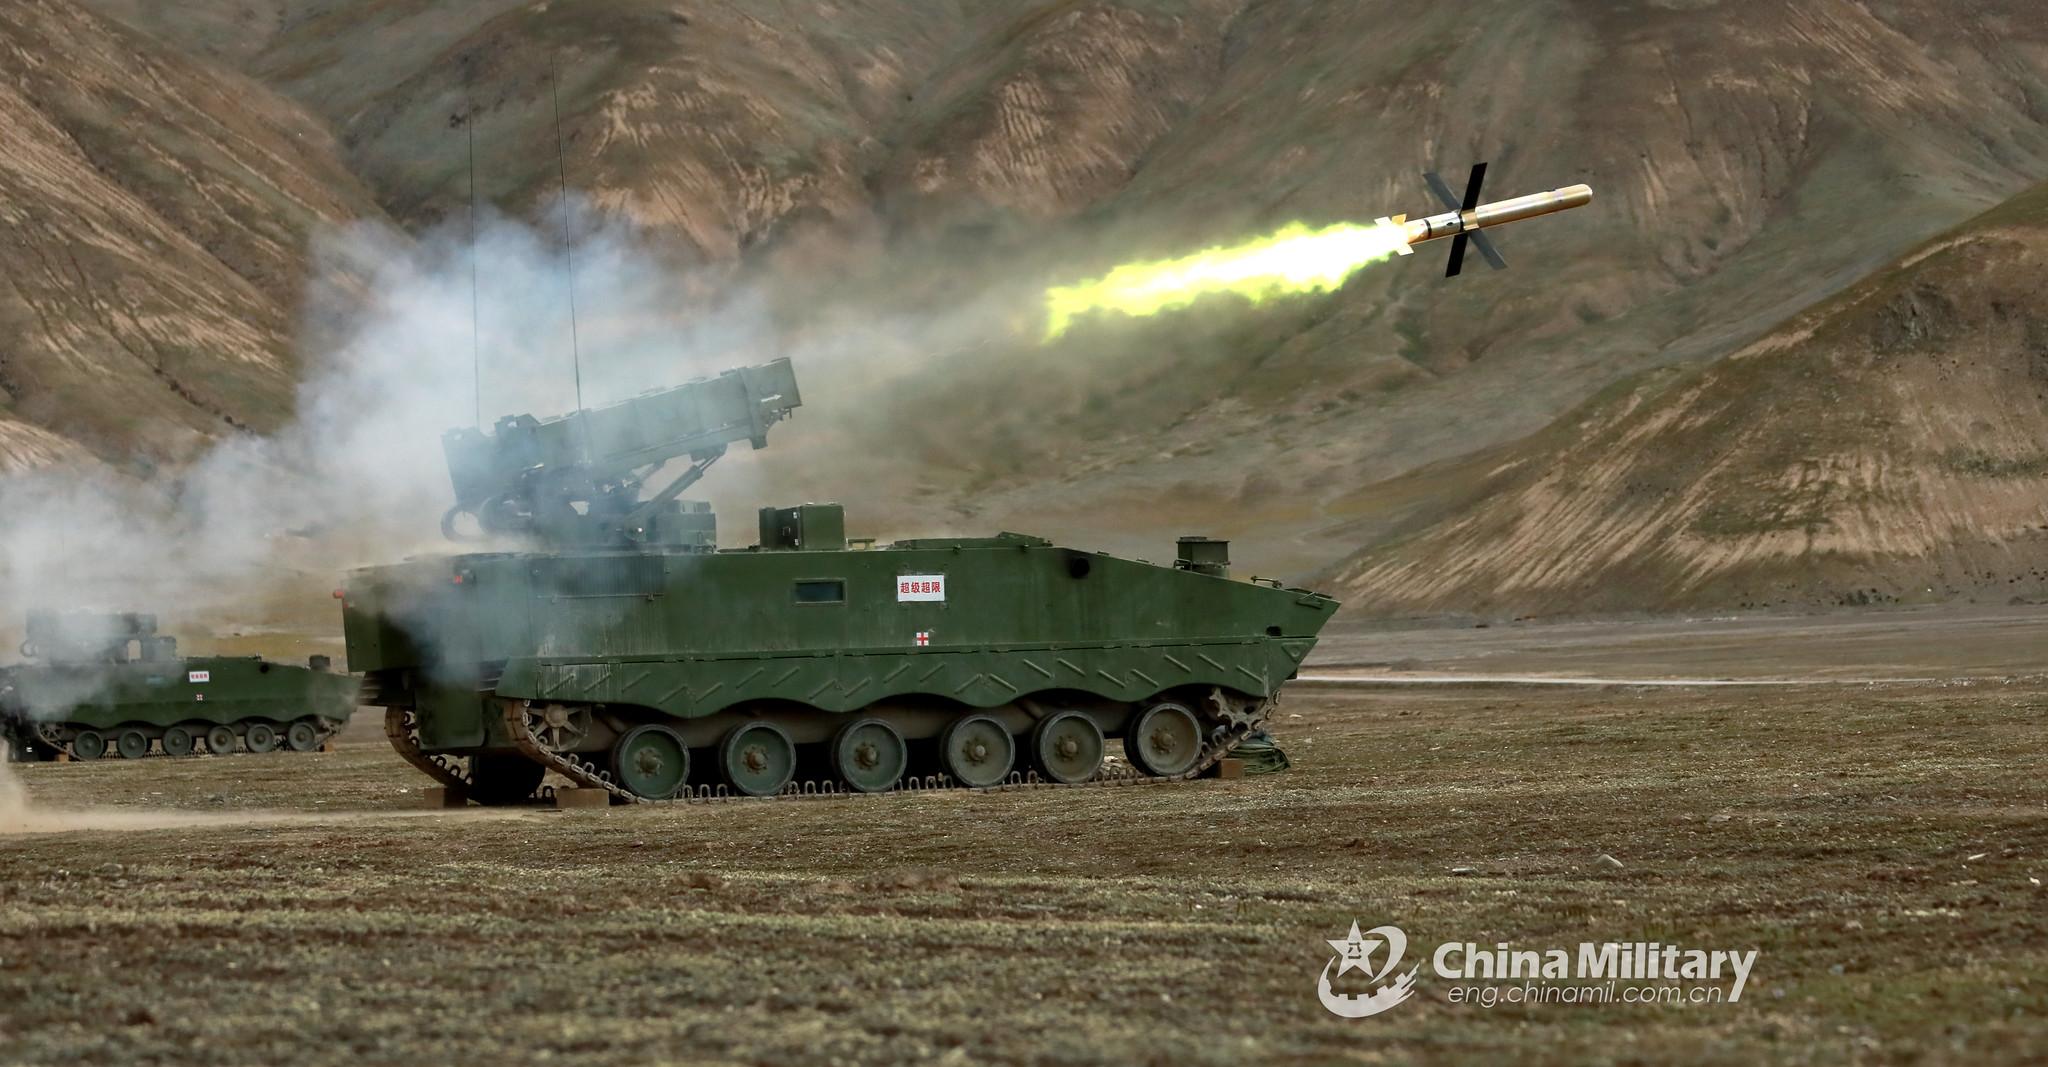 Armée Chinoise / People's Liberation Army (PLA) - Page 34 48877258566_5b98966587_k